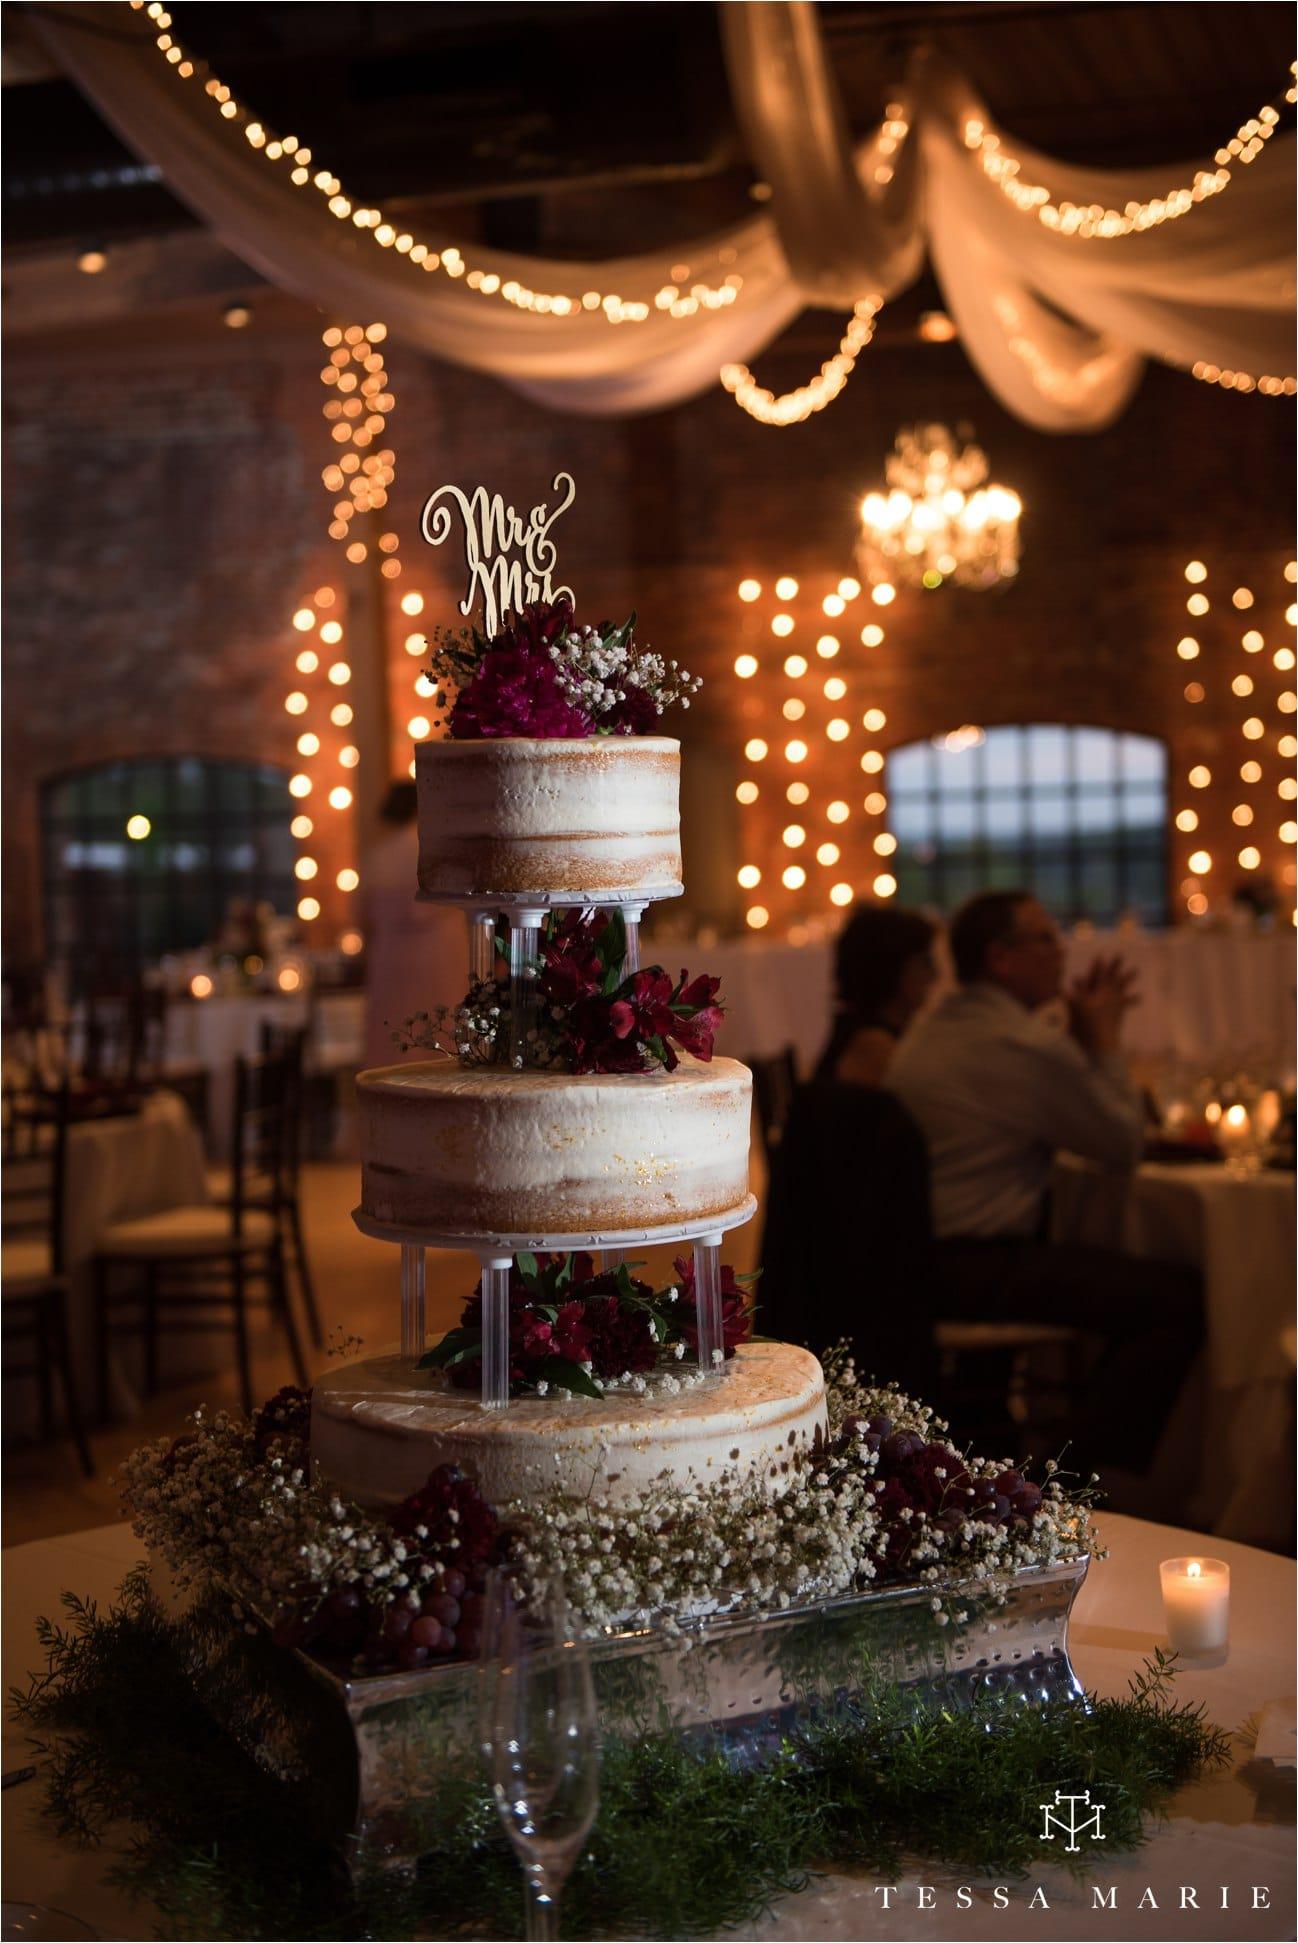 tessa_marie_weddings_rivermill_event_centere_candid_outdoor_wedding_photos_0314